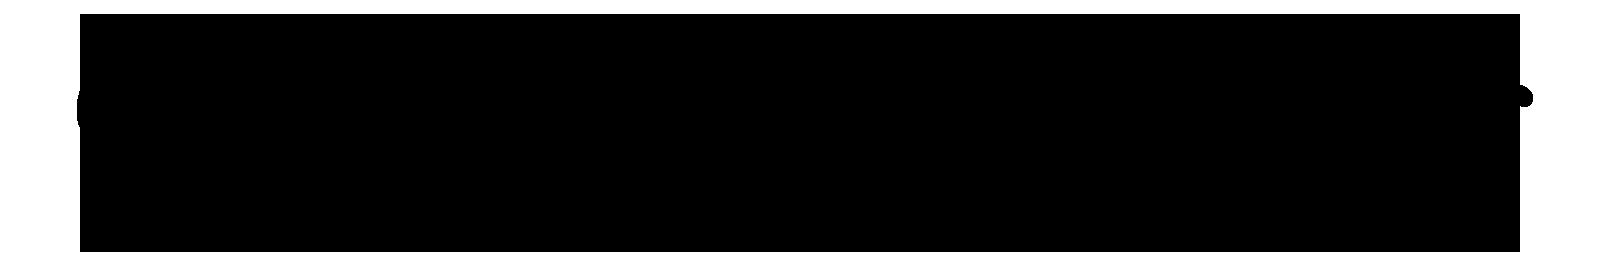 Eblome Design